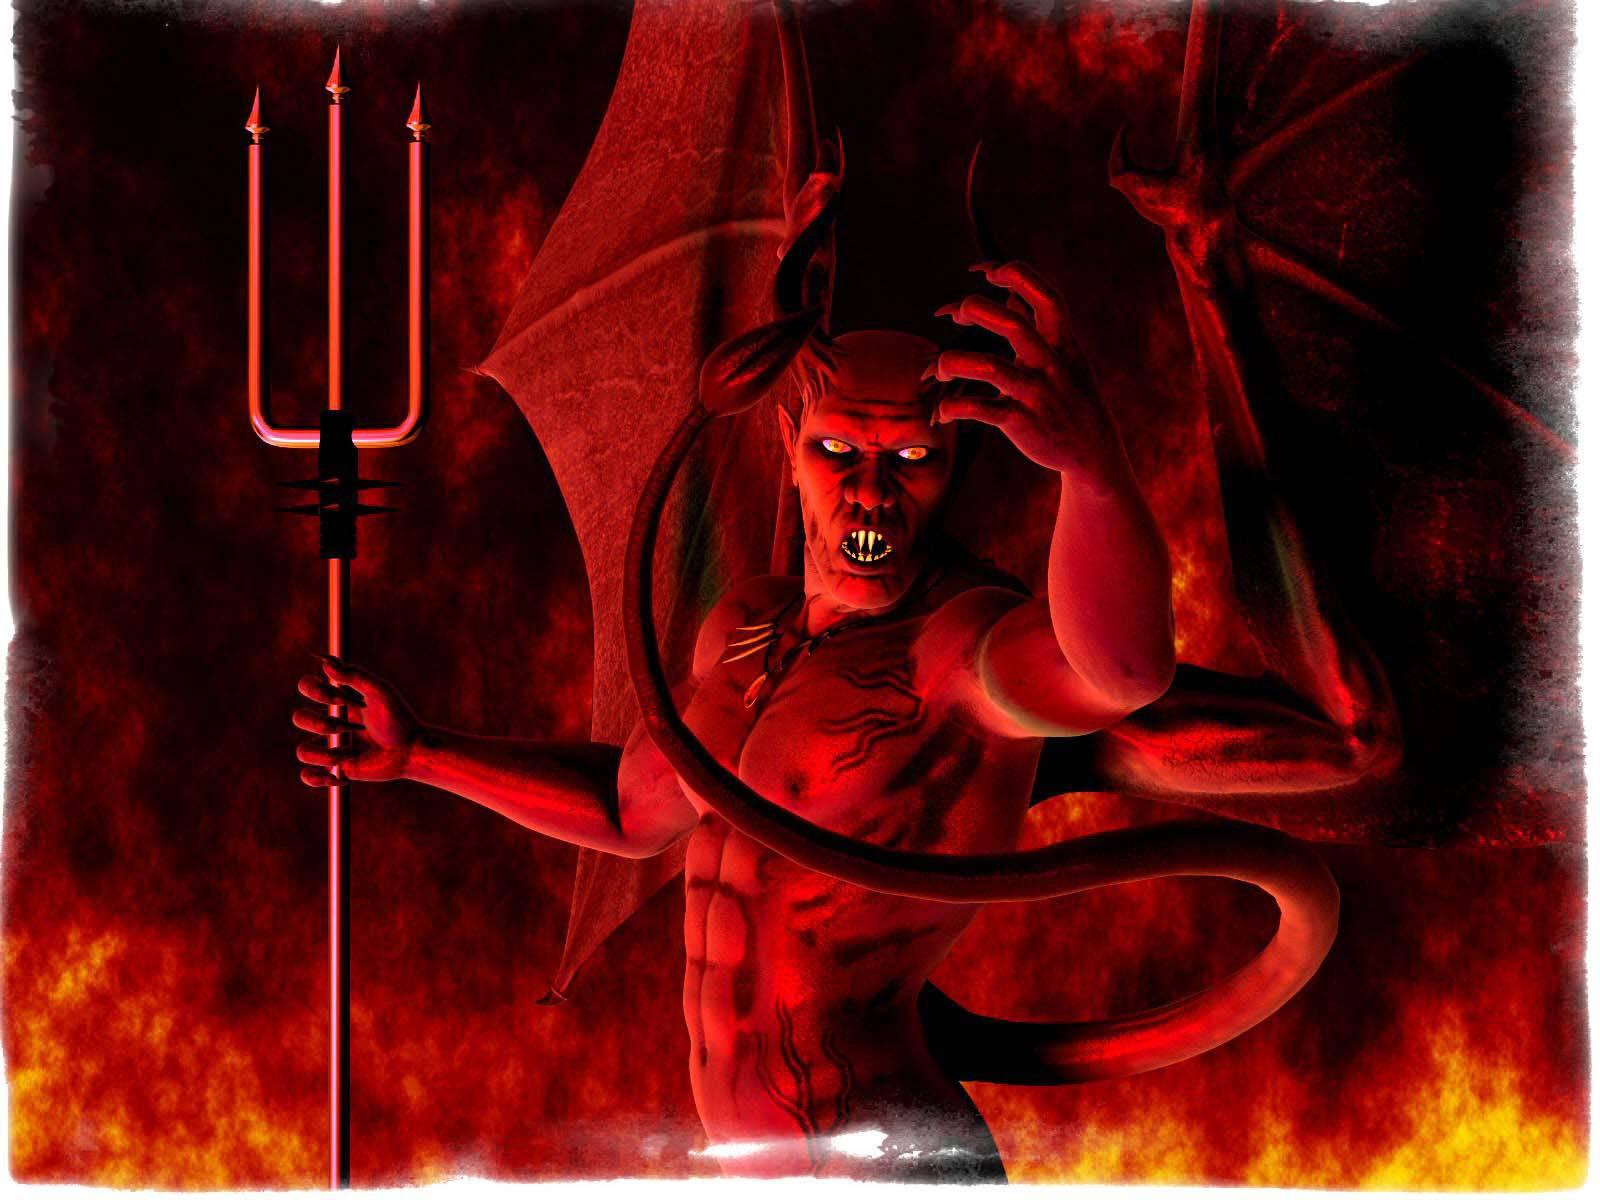 Самаэль(дьявол,сатана)   злодеи вики   fandom